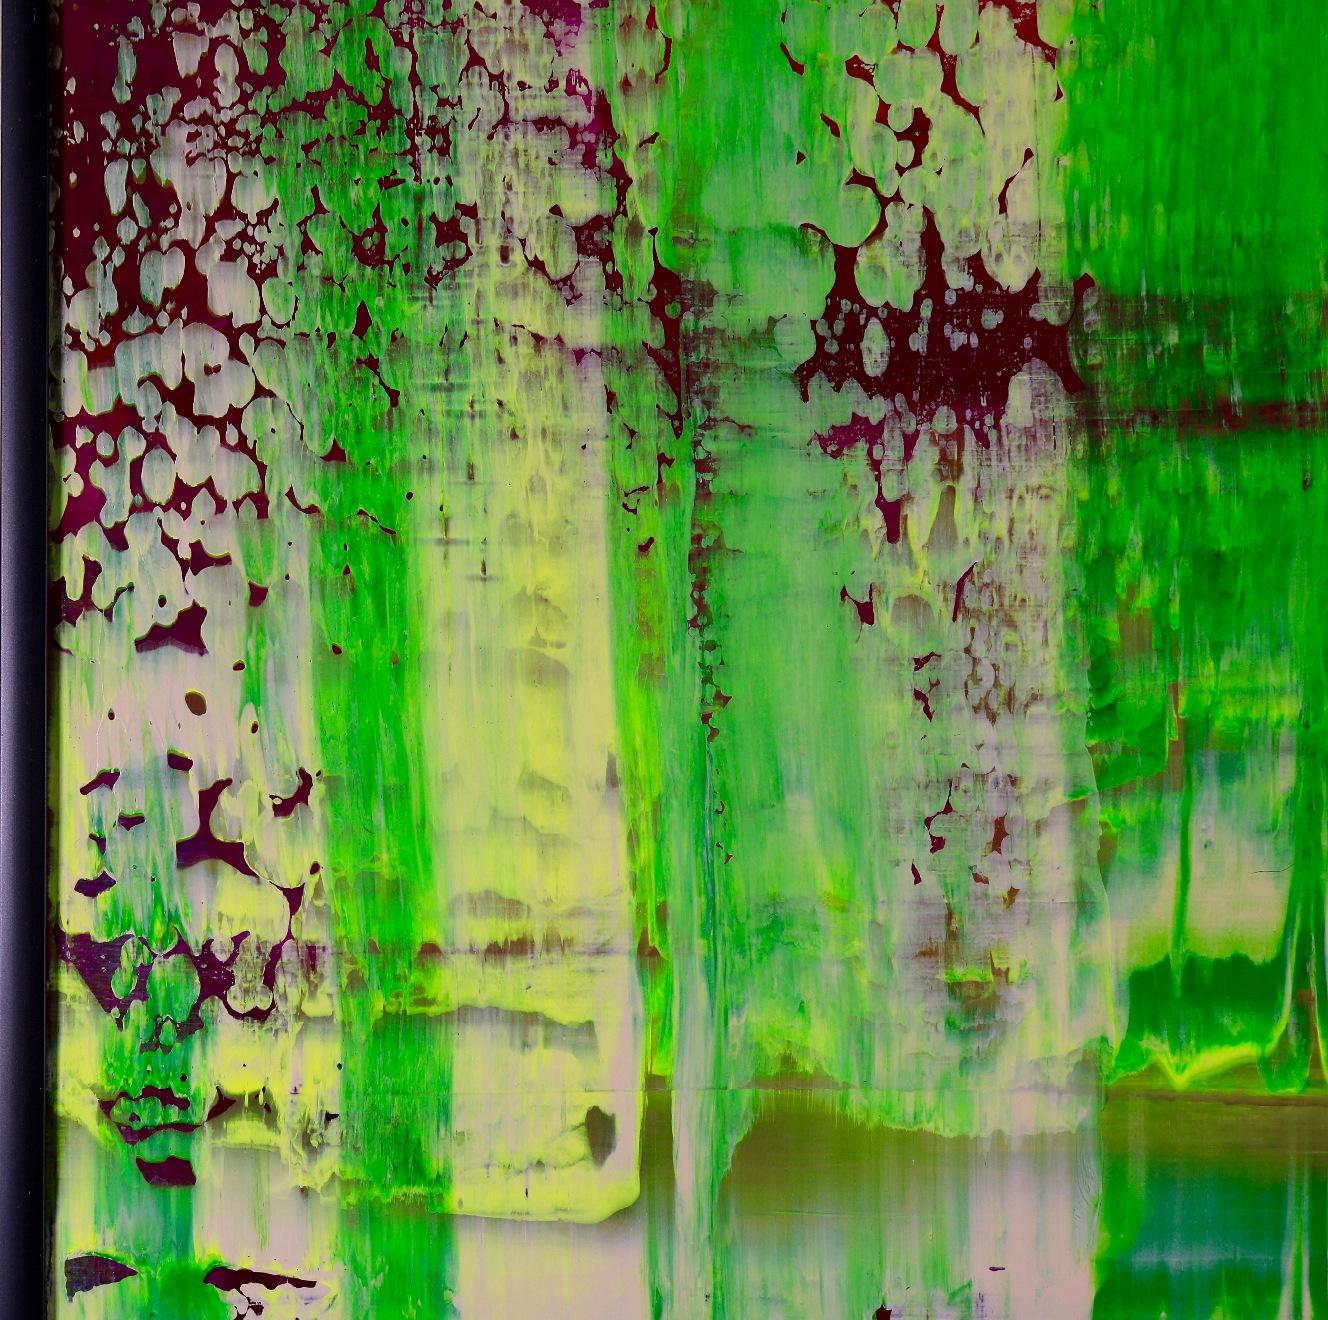 SOLD - Translucent Landscape by artist Nestor Toro